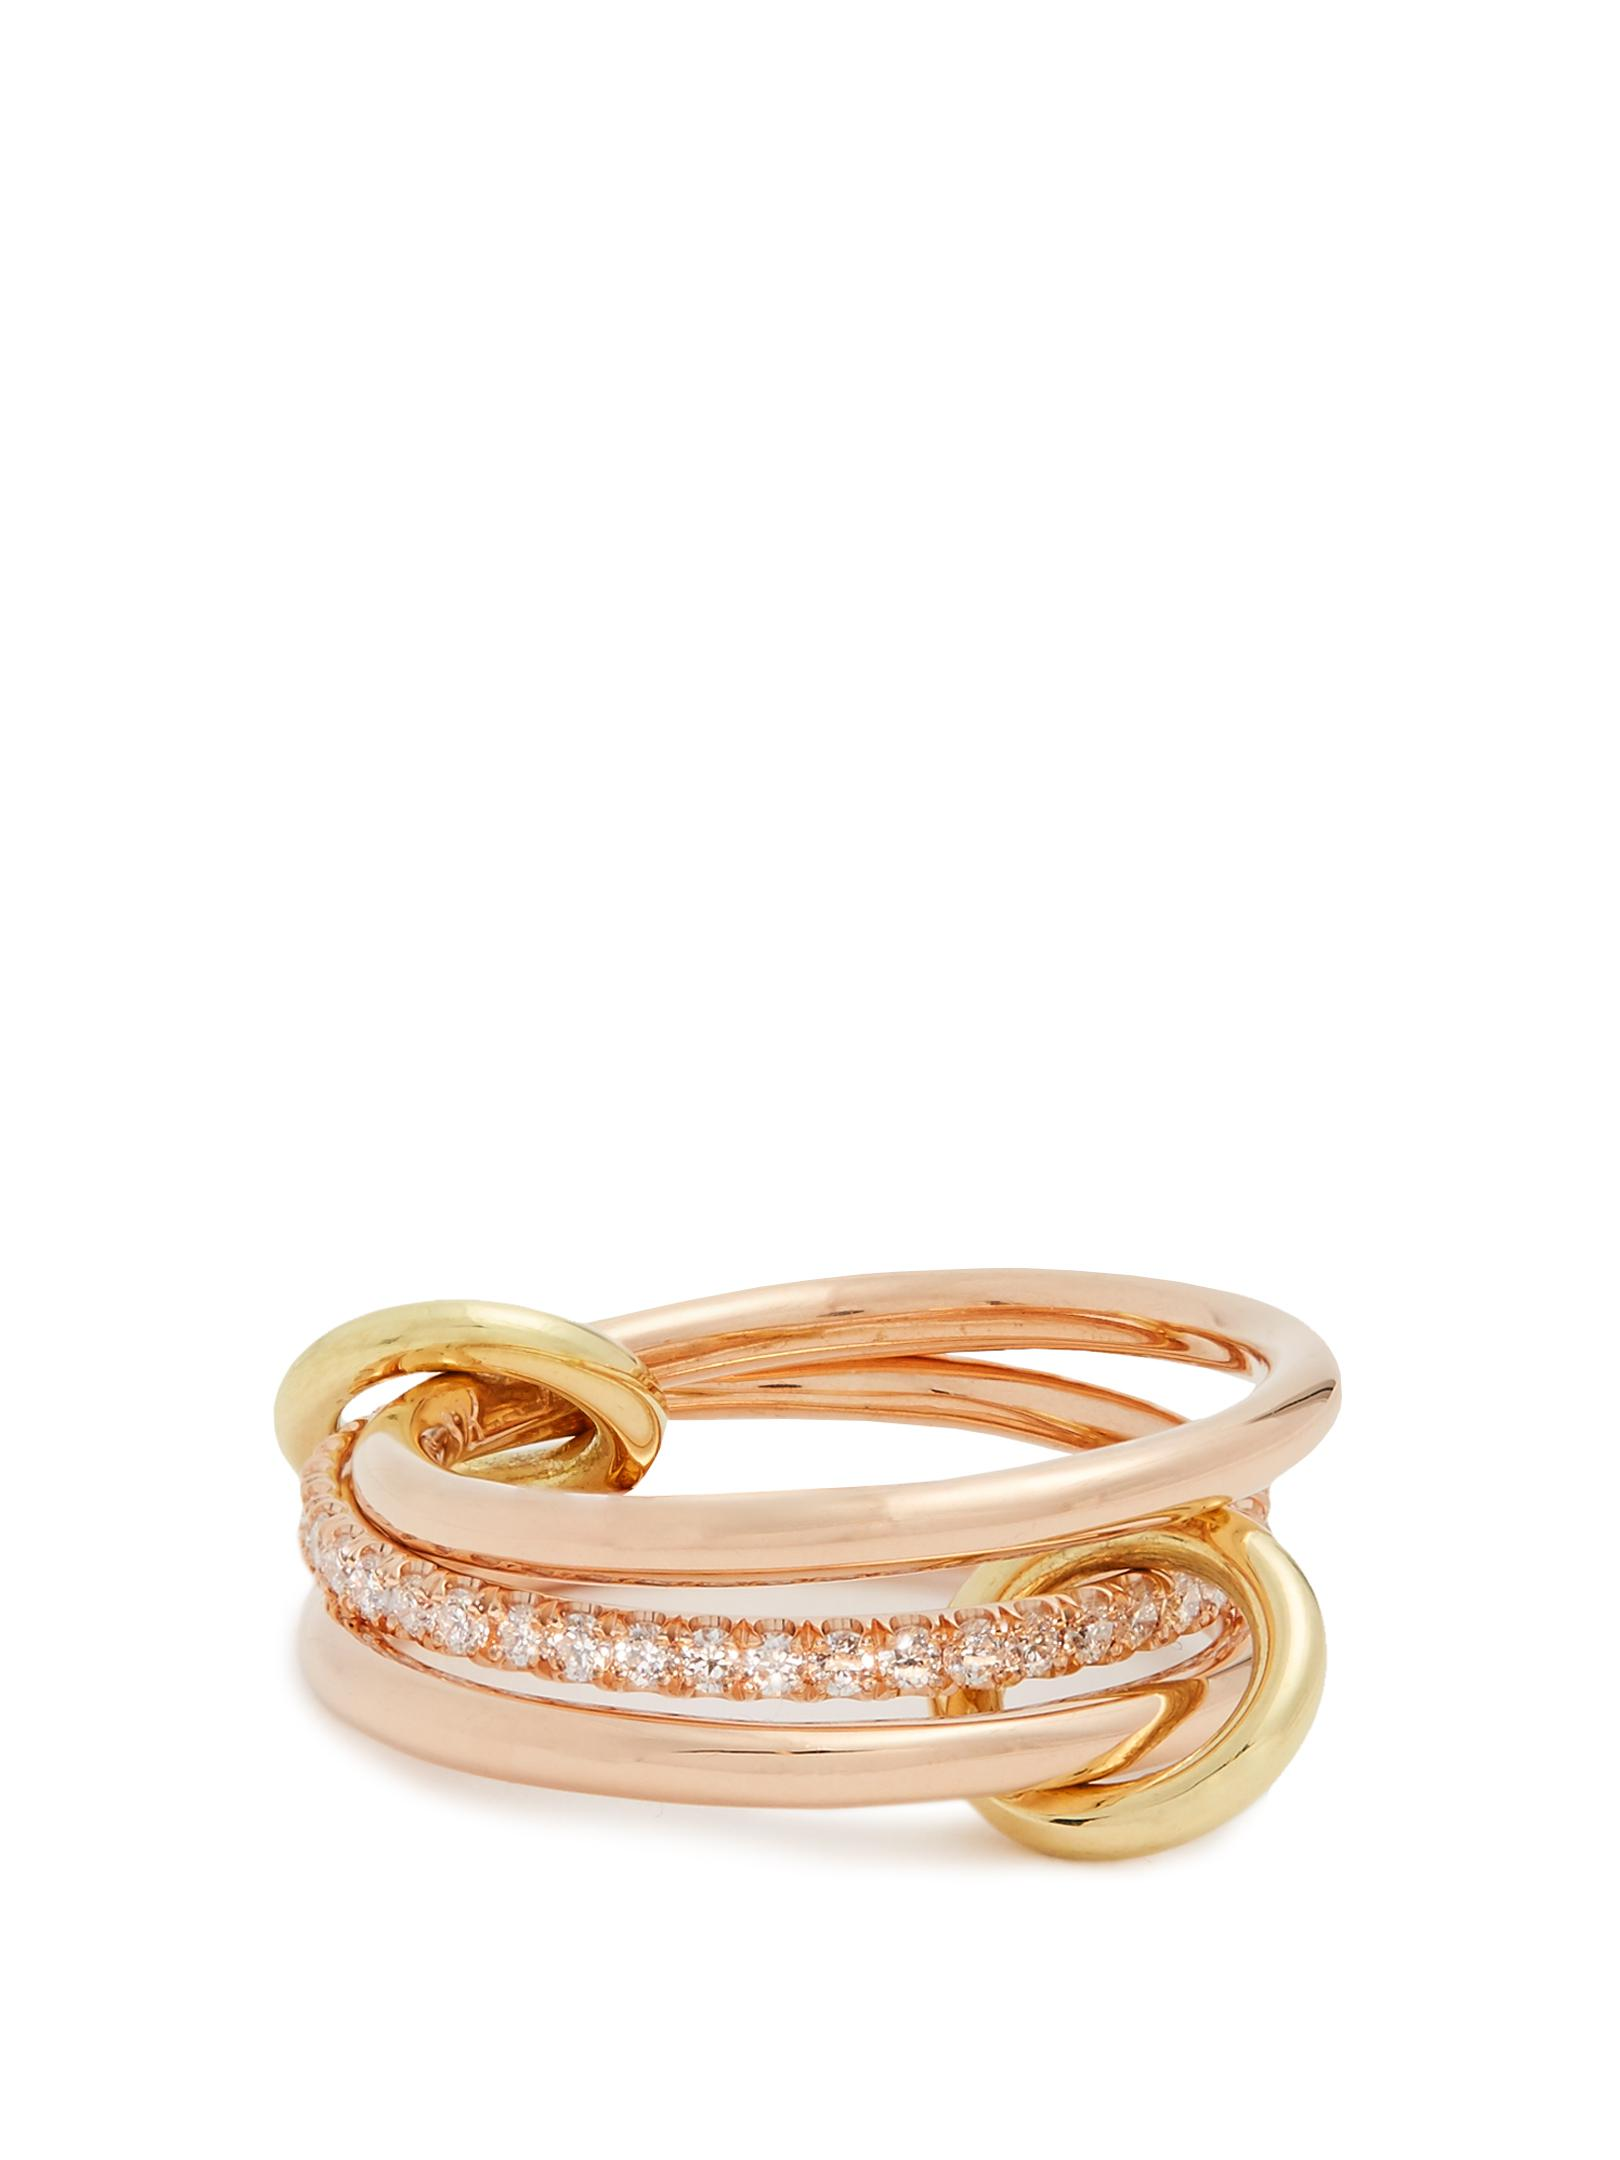 Sonny 18kt rose-gold, diamond and morganite ring Spinelli Kilcollin